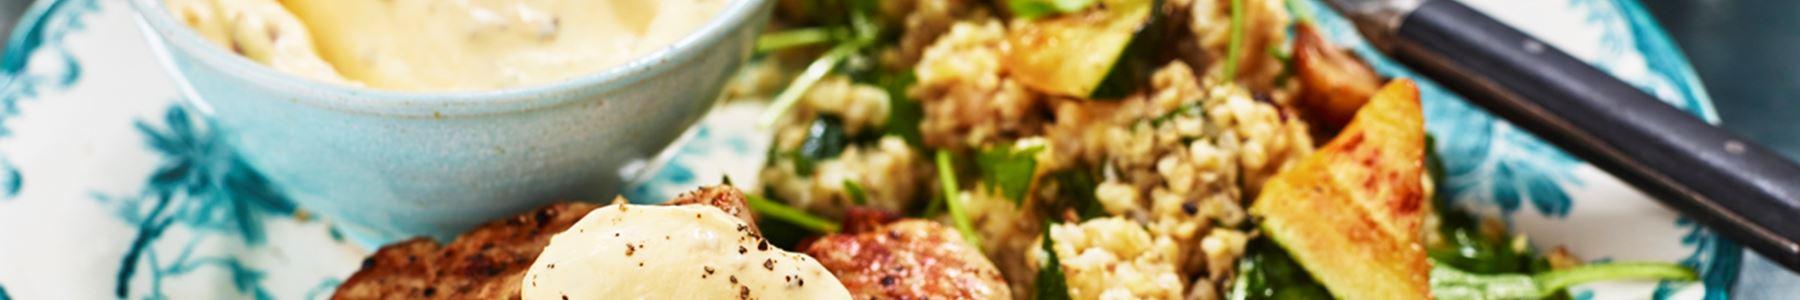 Zucchini + Champinjoner + Grillad